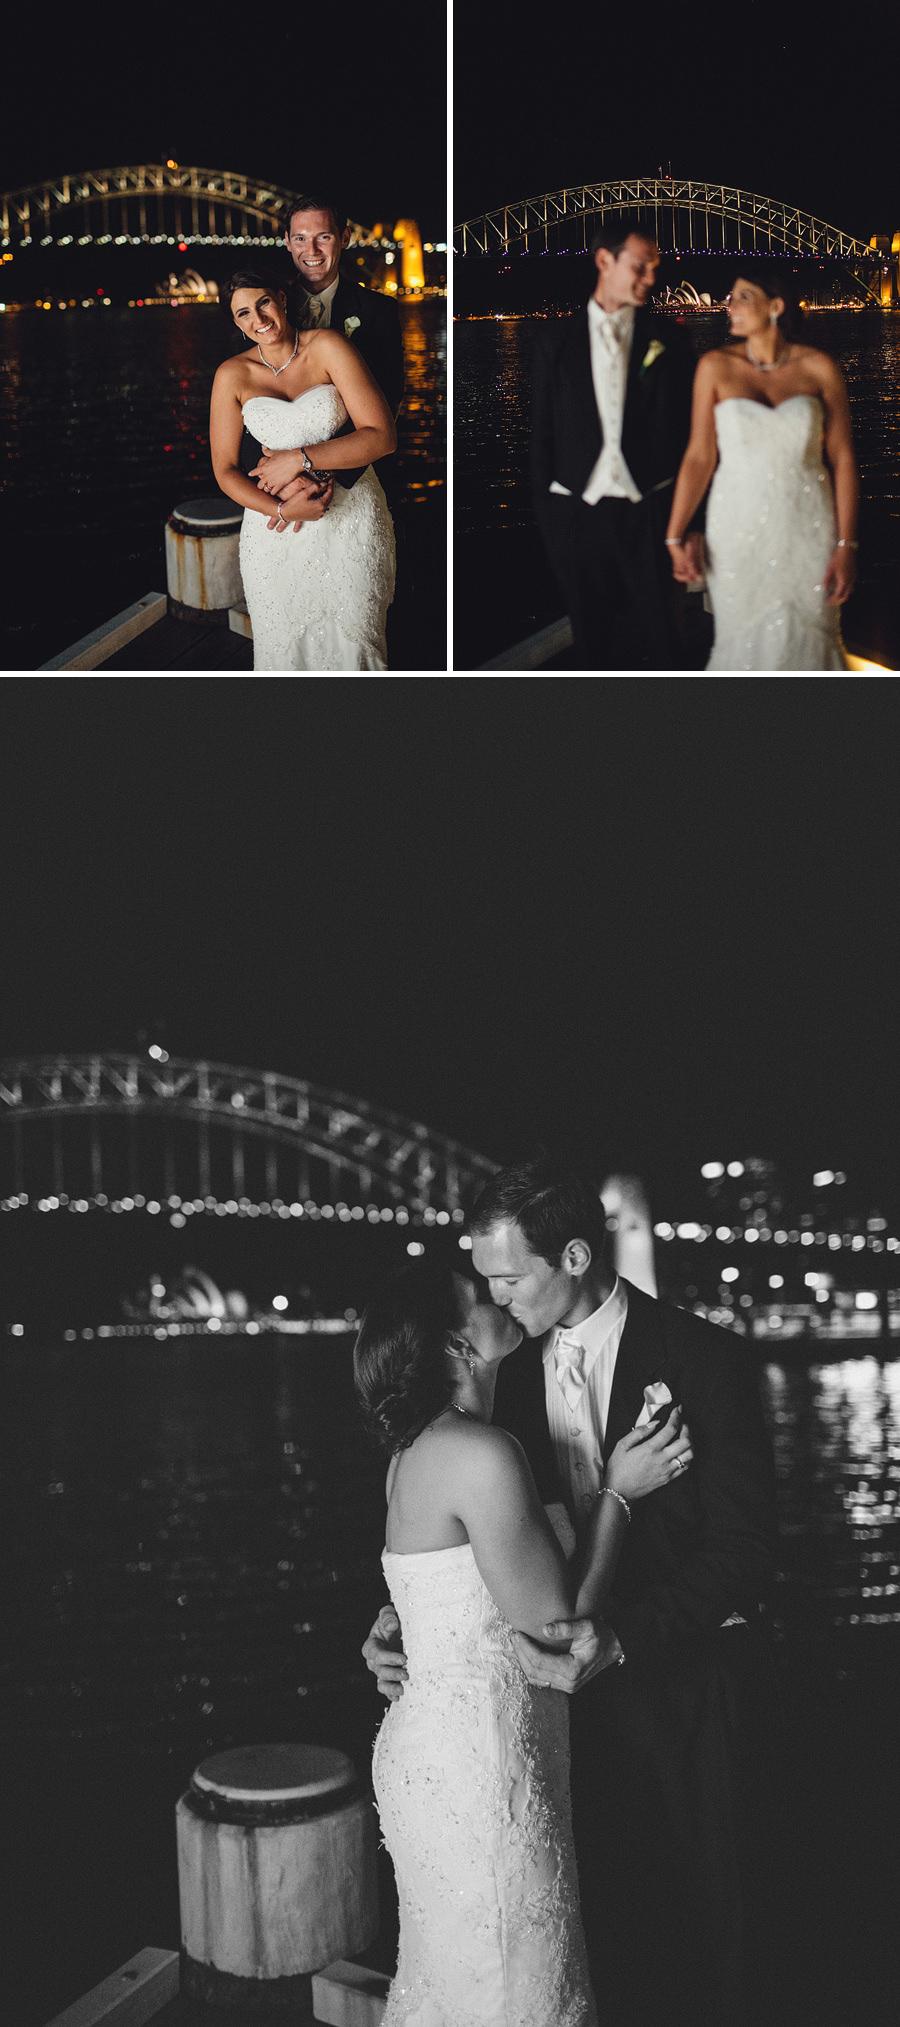 Sydney Harbour Wedding Photographer: Night Portraits